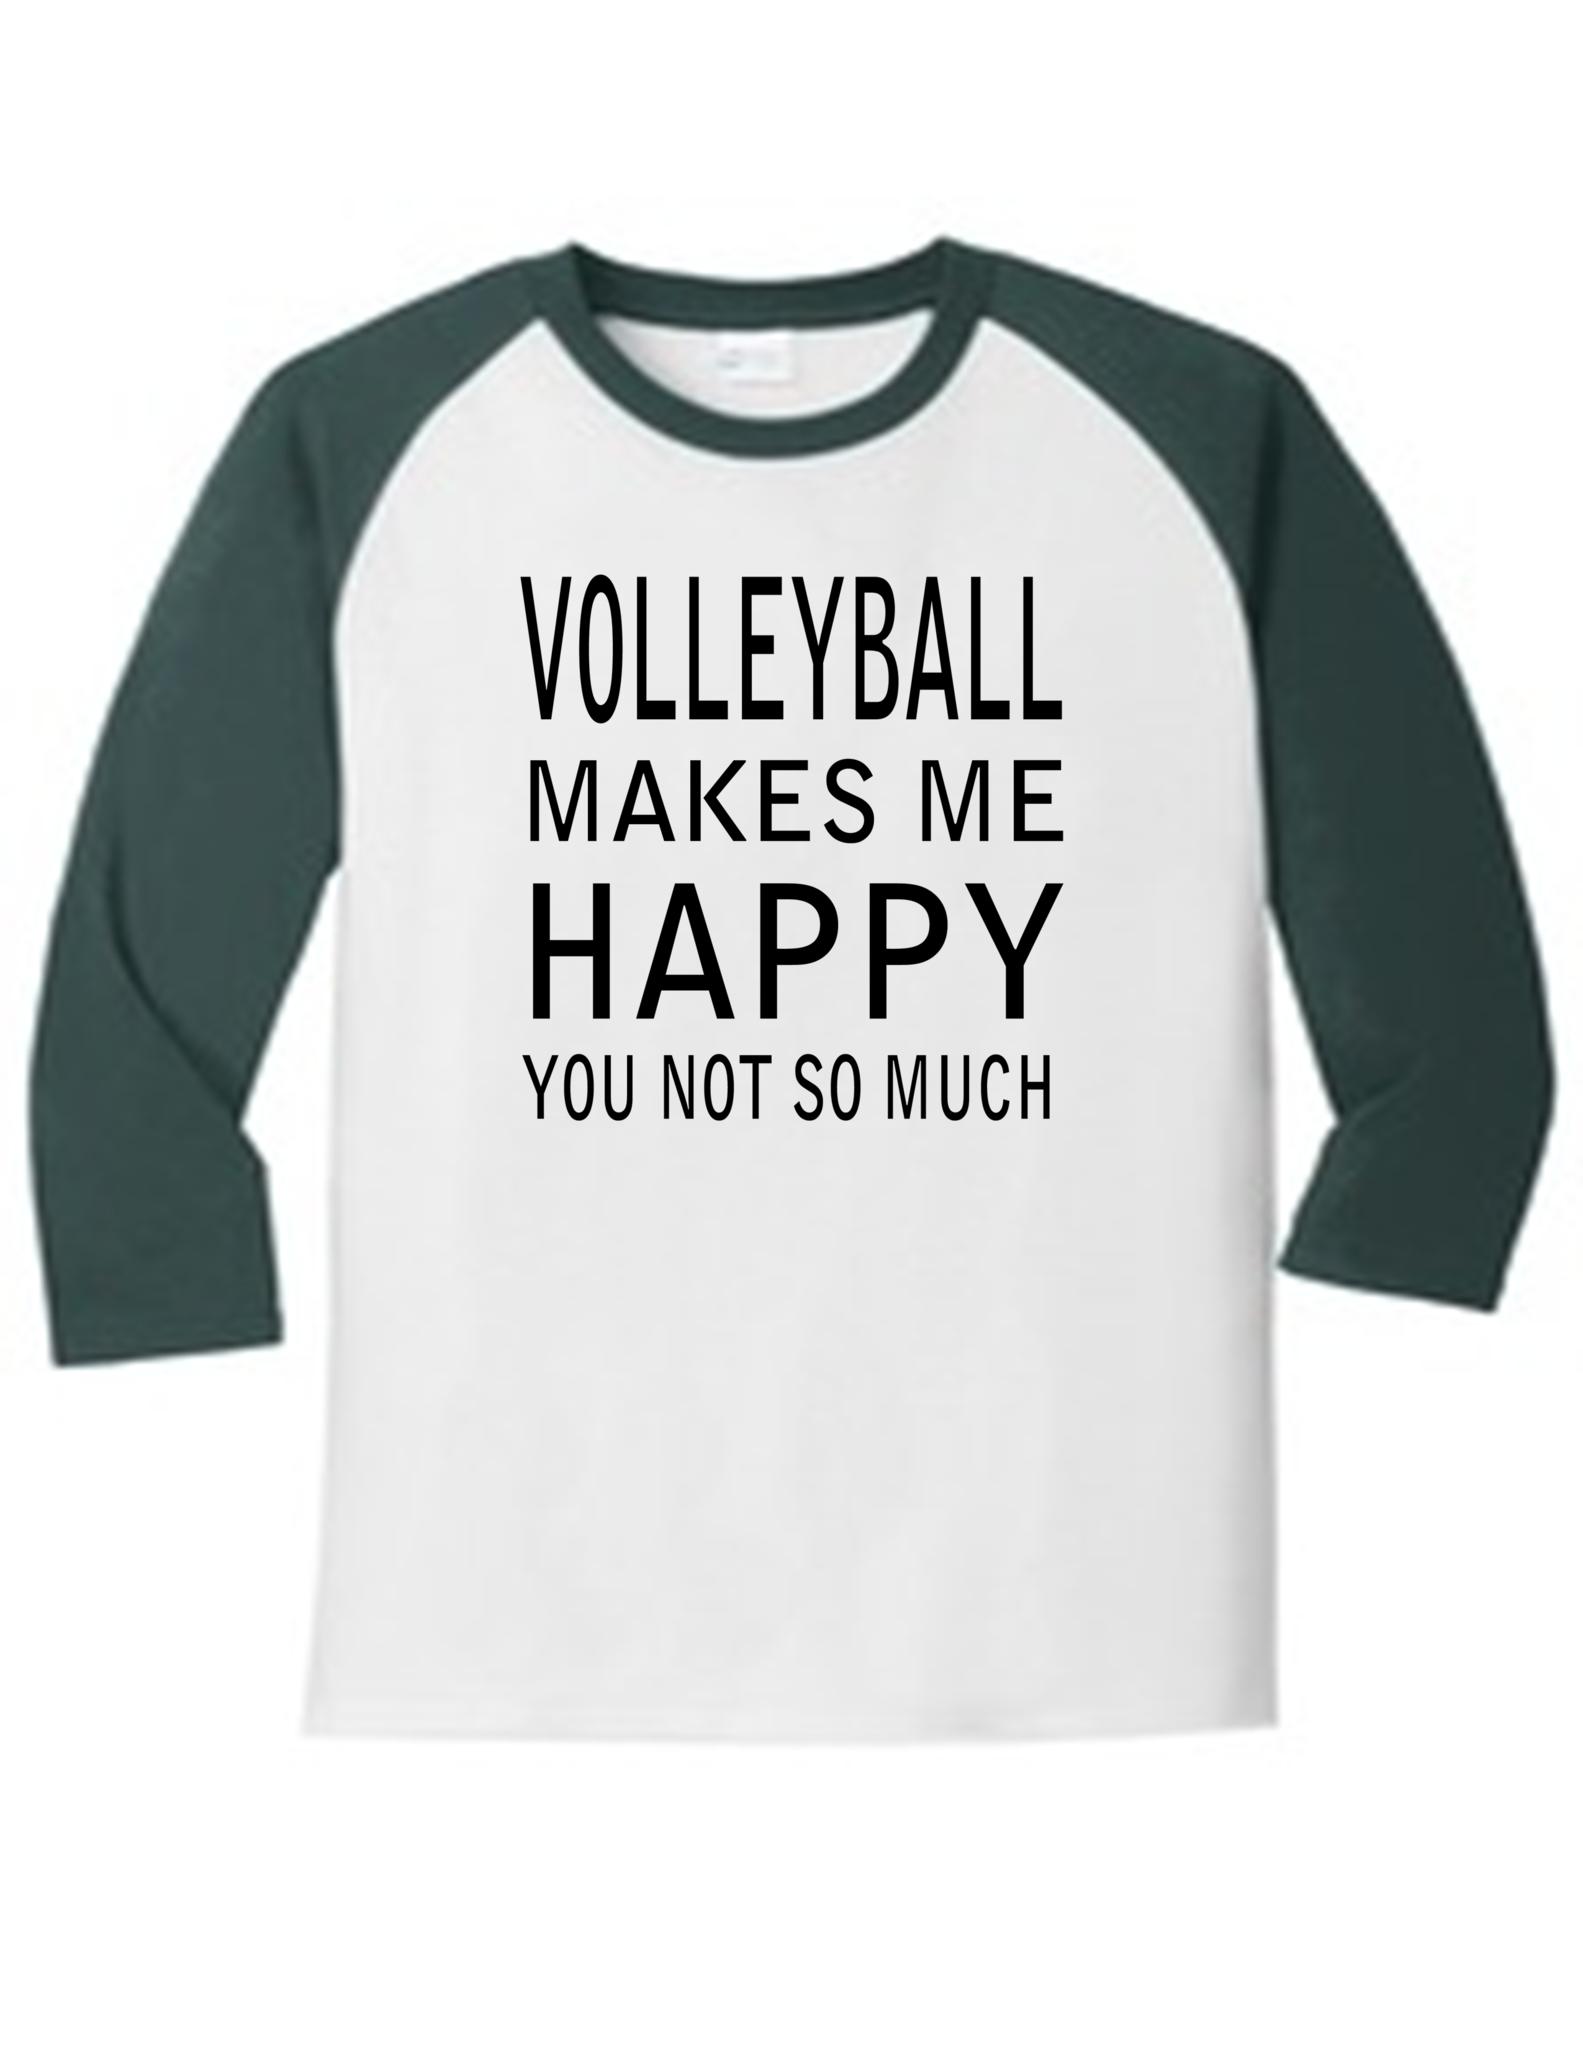 Volleyball Makes Me Happy Slogan Tshirt Slogan T Shirt